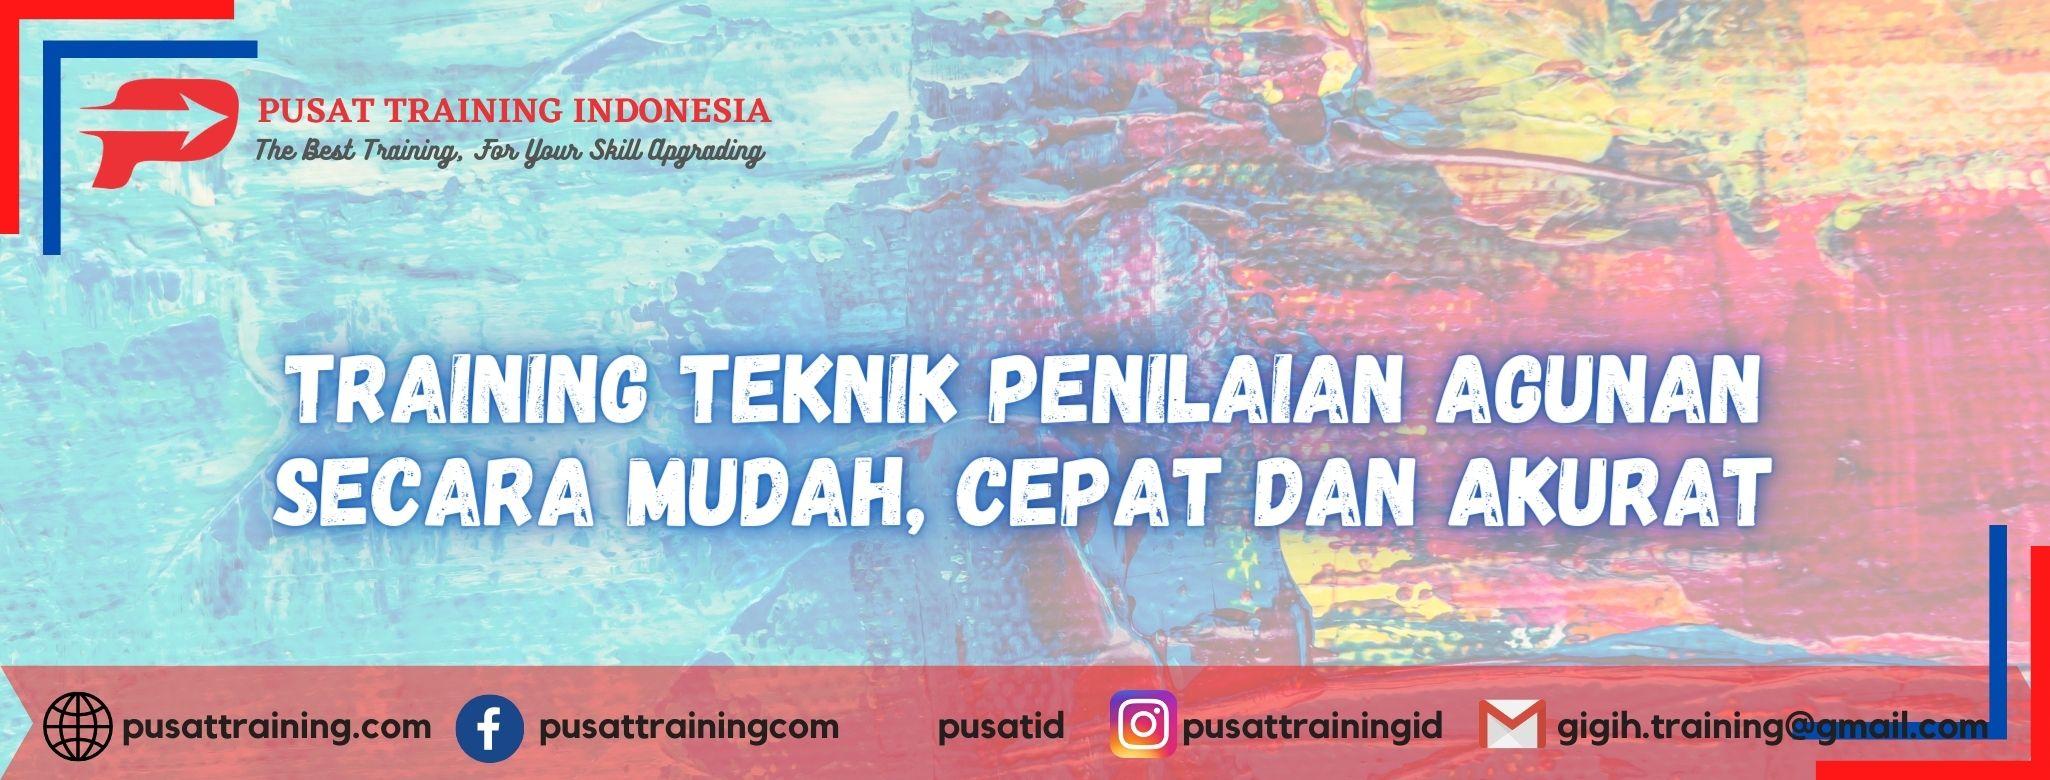 Training-Teknik-Penilaian-Agunan-Secara-Mudah-Cepat-Dan-Akurat